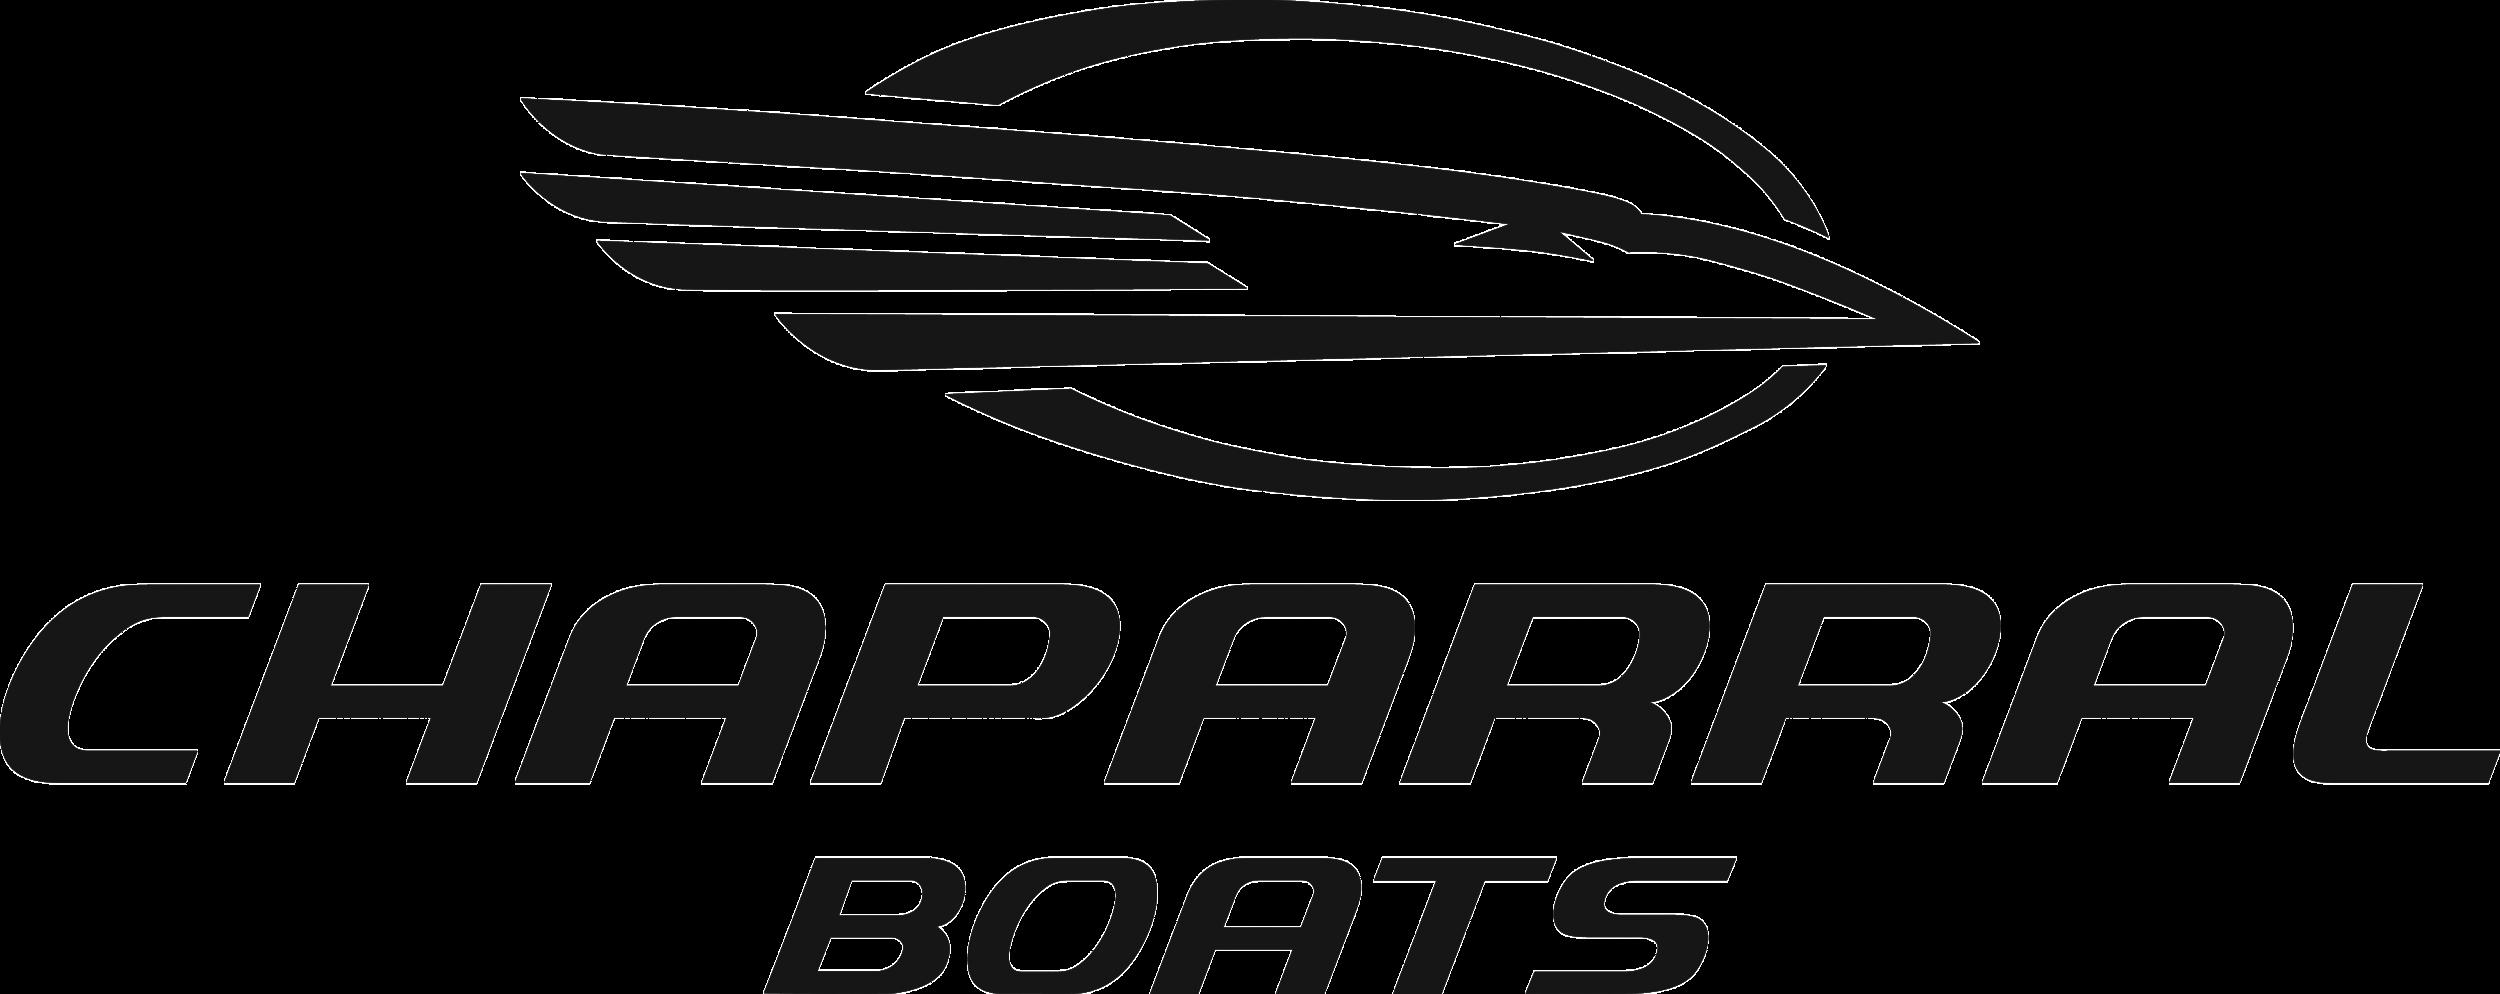 ChapBoats-Black-Logo[1].png